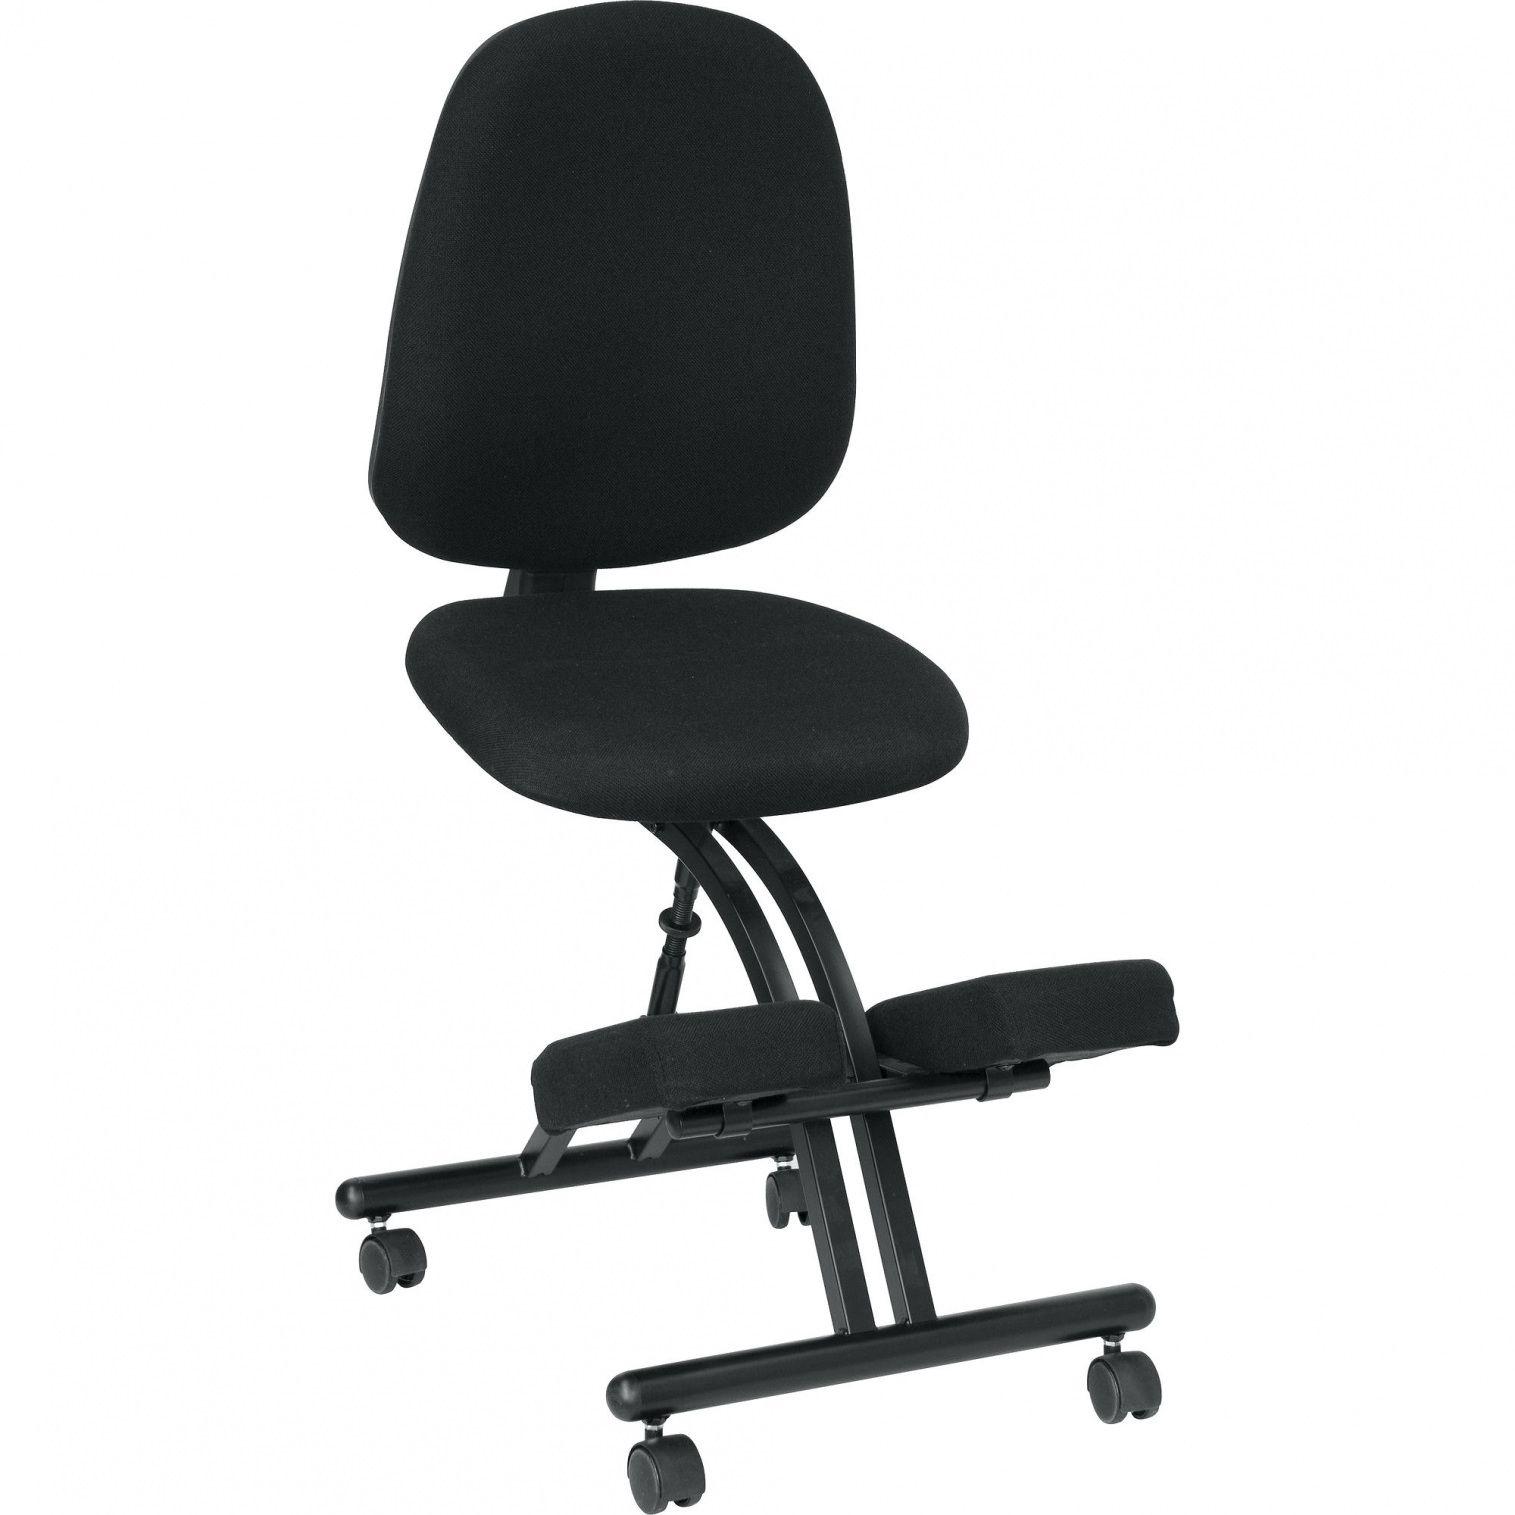 Knee Chair IKEA Designs Ideas chair ikea designs ideas Home Furniture Pinterest